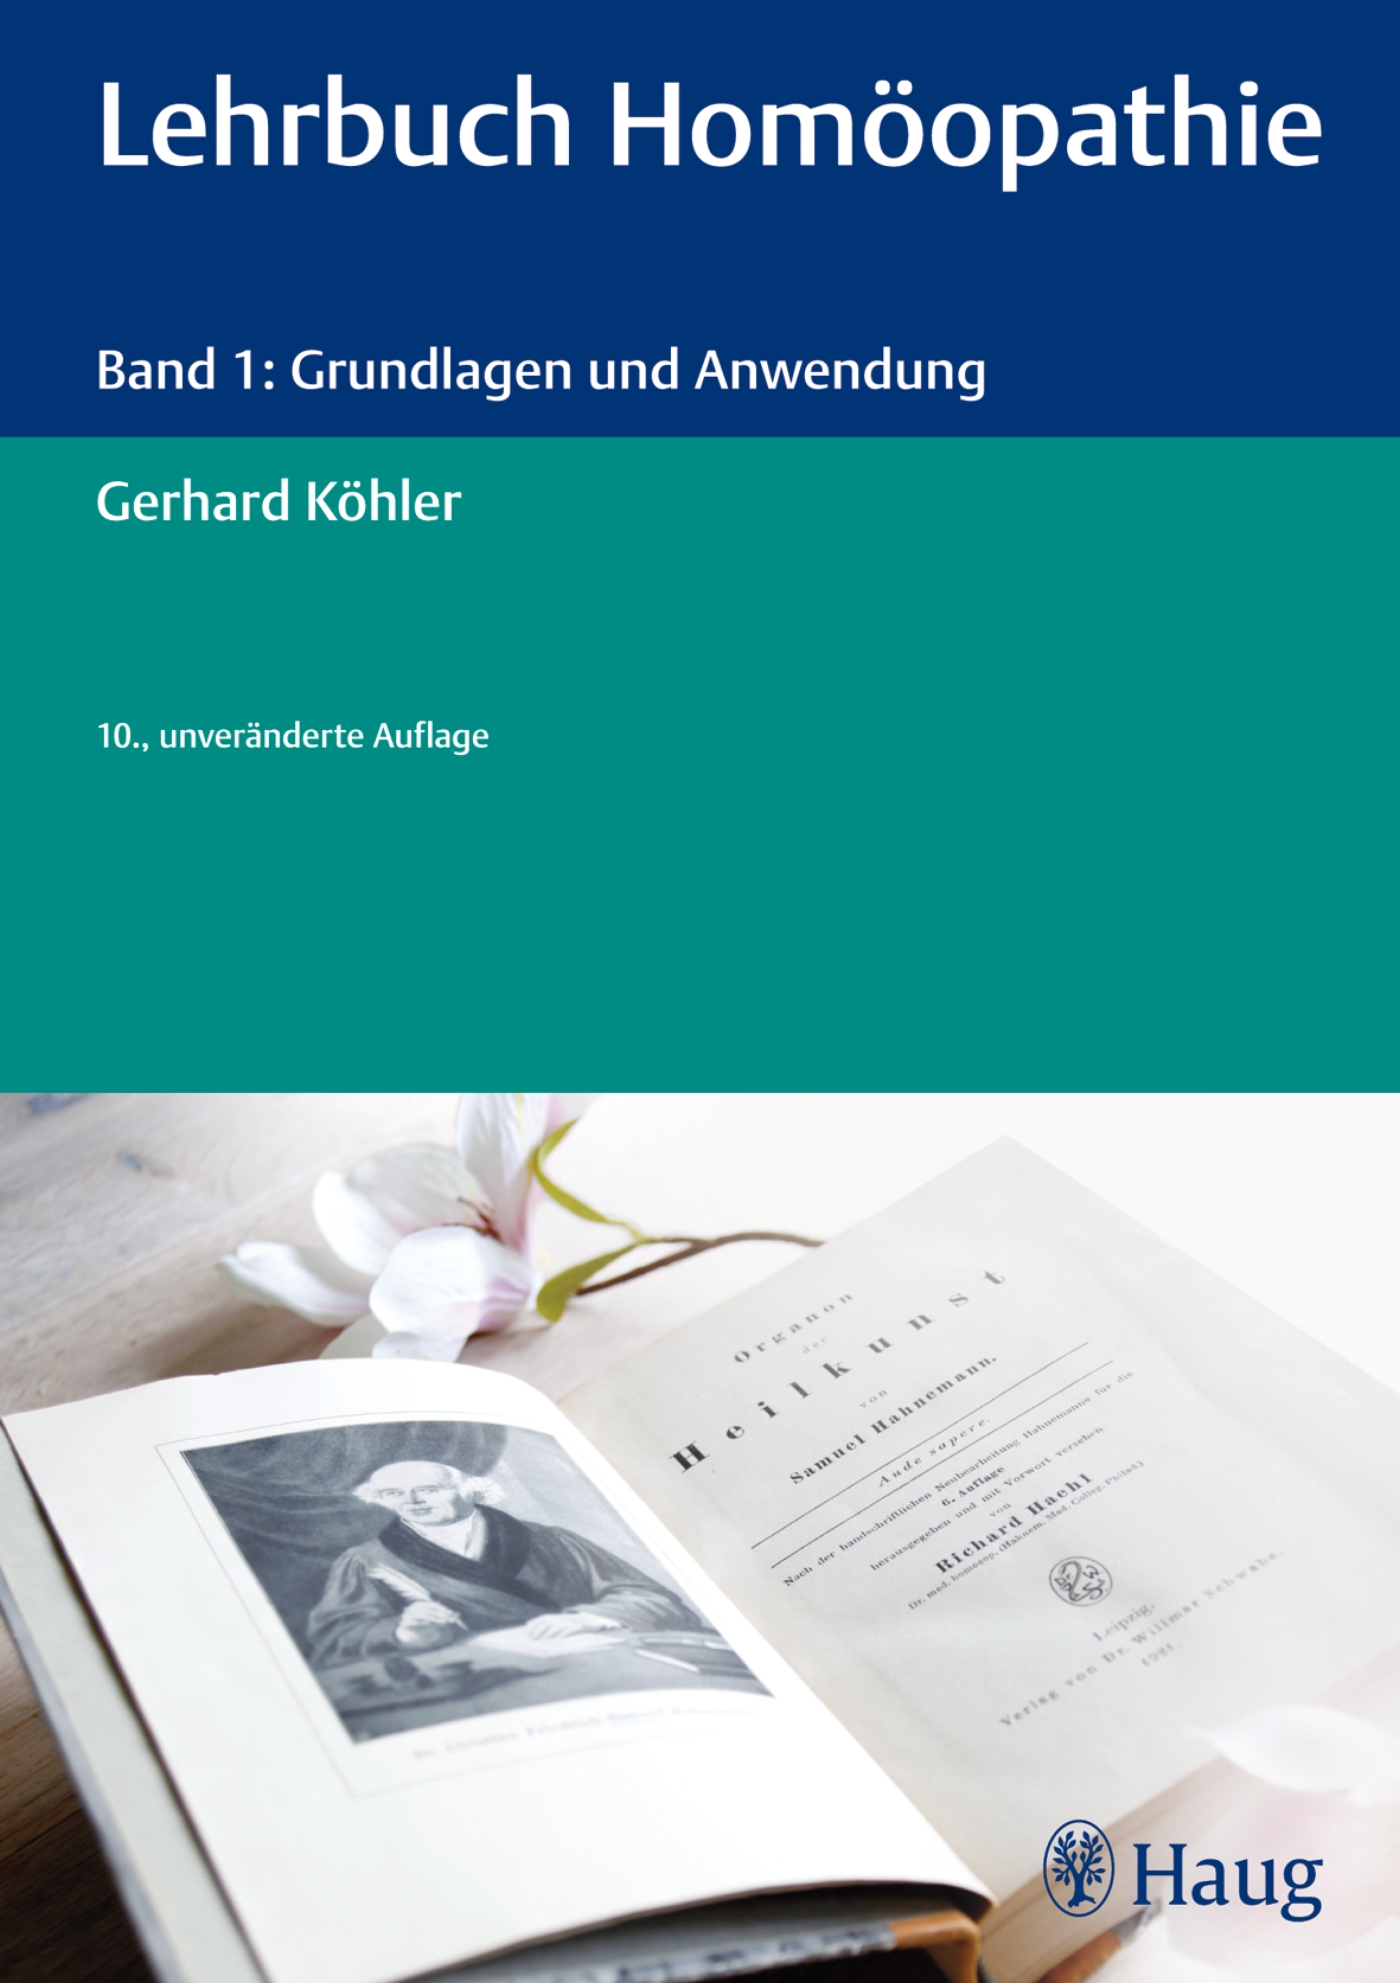 Lehrbuch Homöopathie